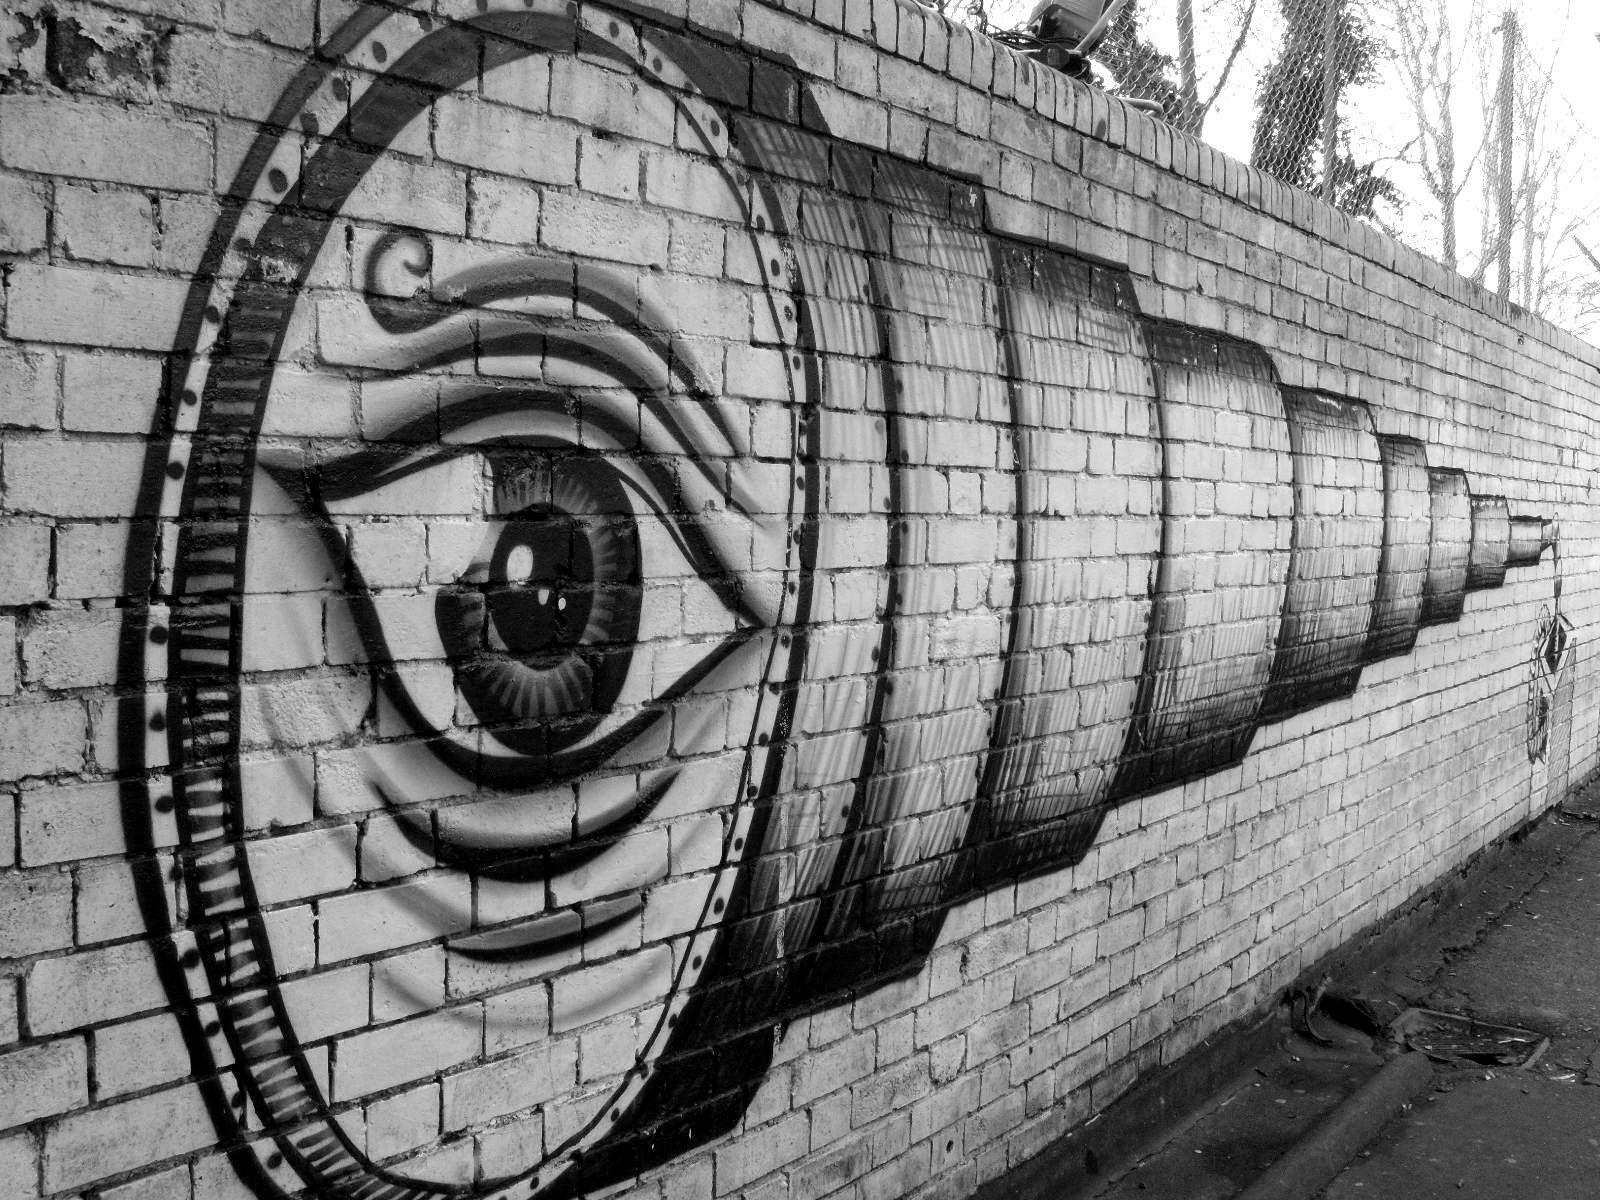 Street art London - part 2: Phlegm